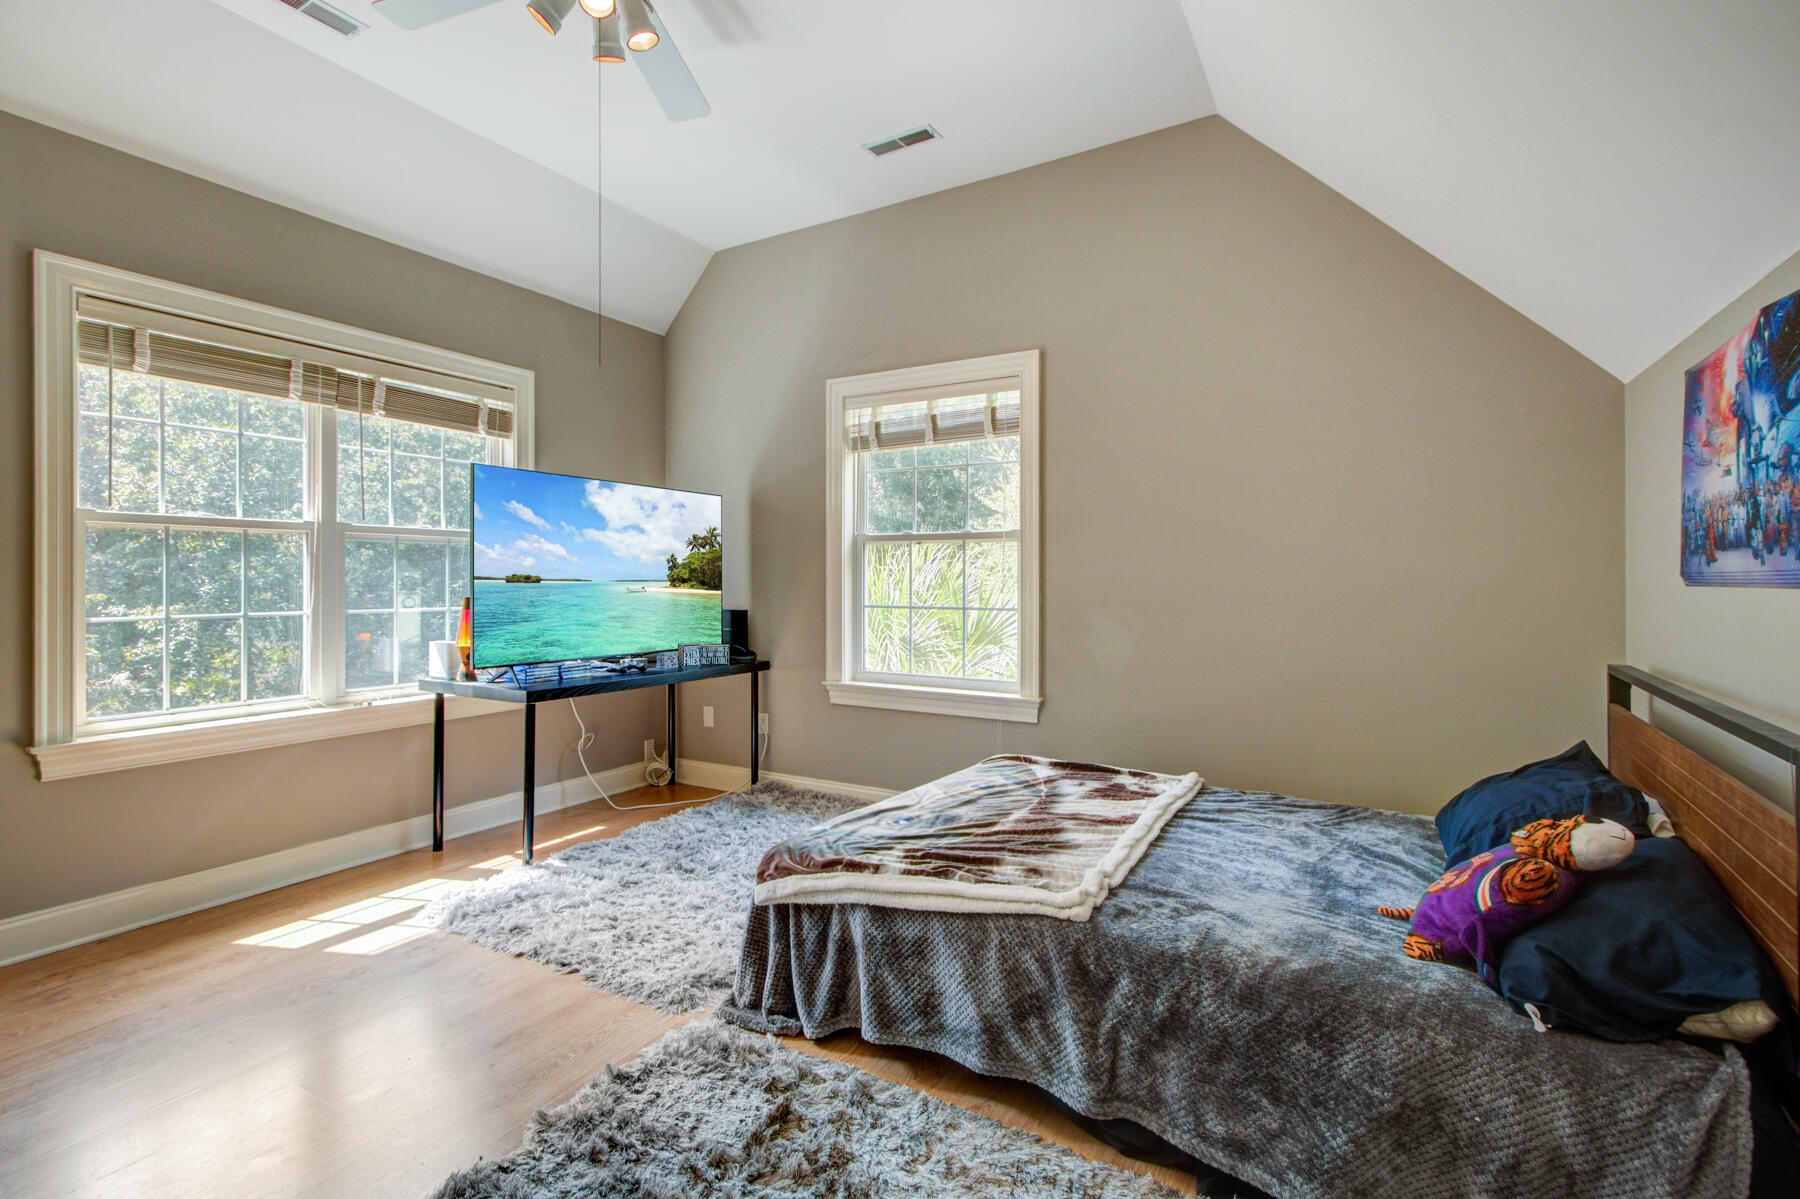 Dunes West Homes For Sale - 3095 Pignatelli, Mount Pleasant, SC - 56